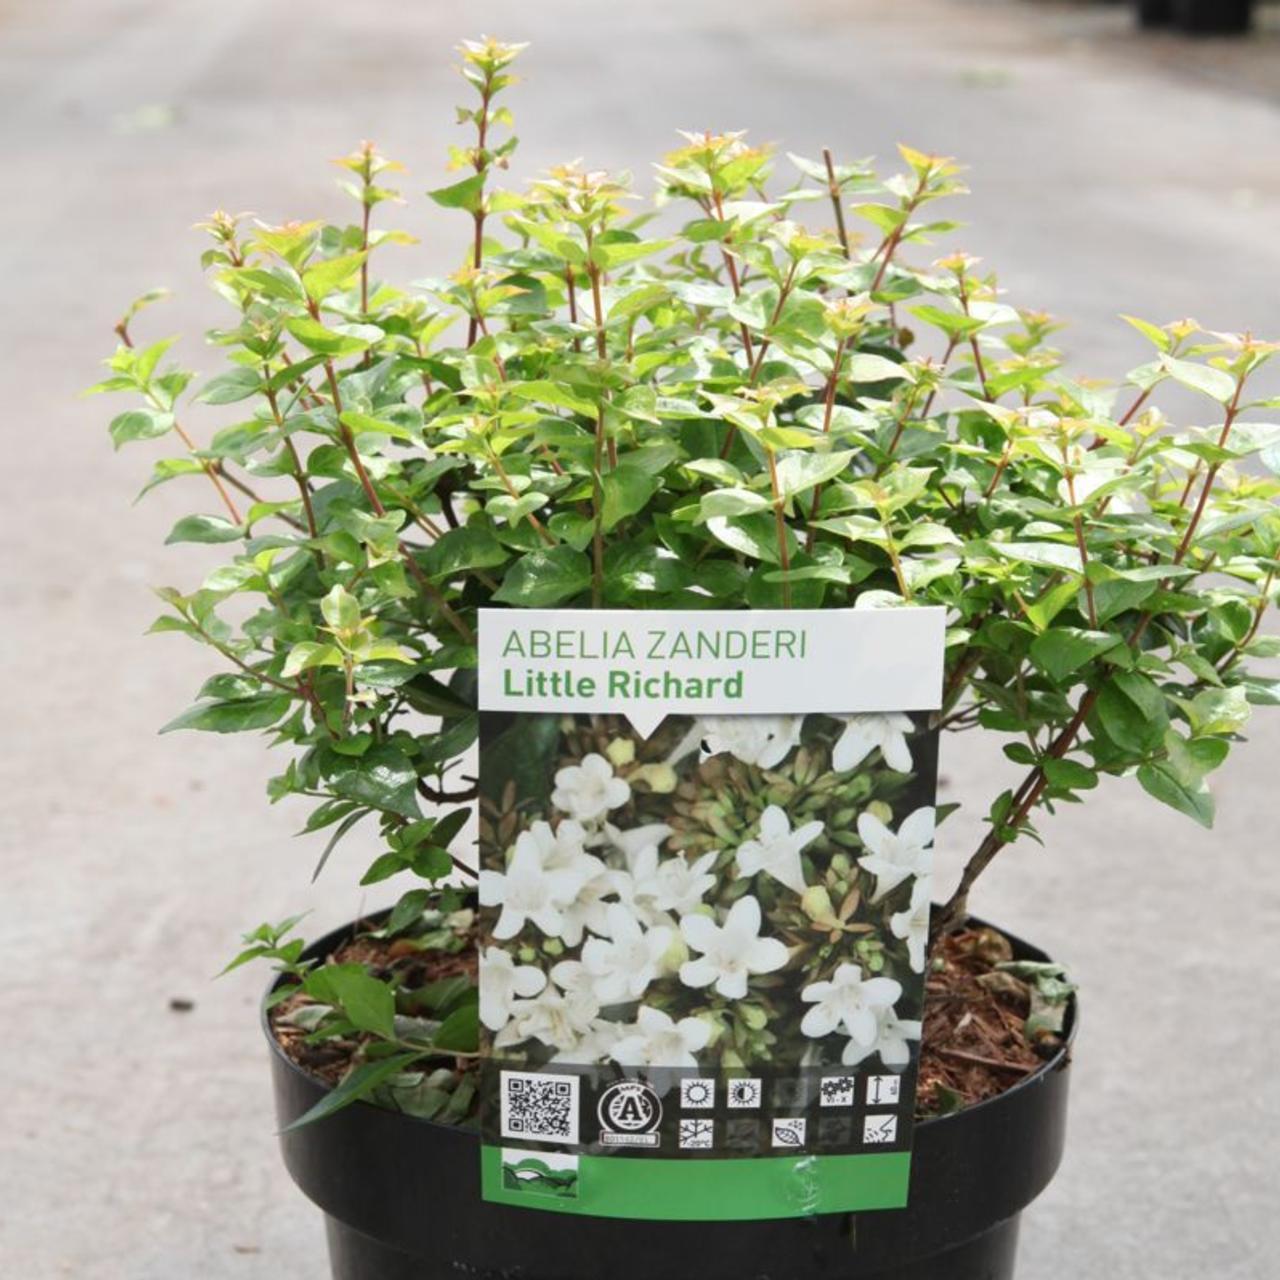 Abelia zanderi 'Little Richard' plant